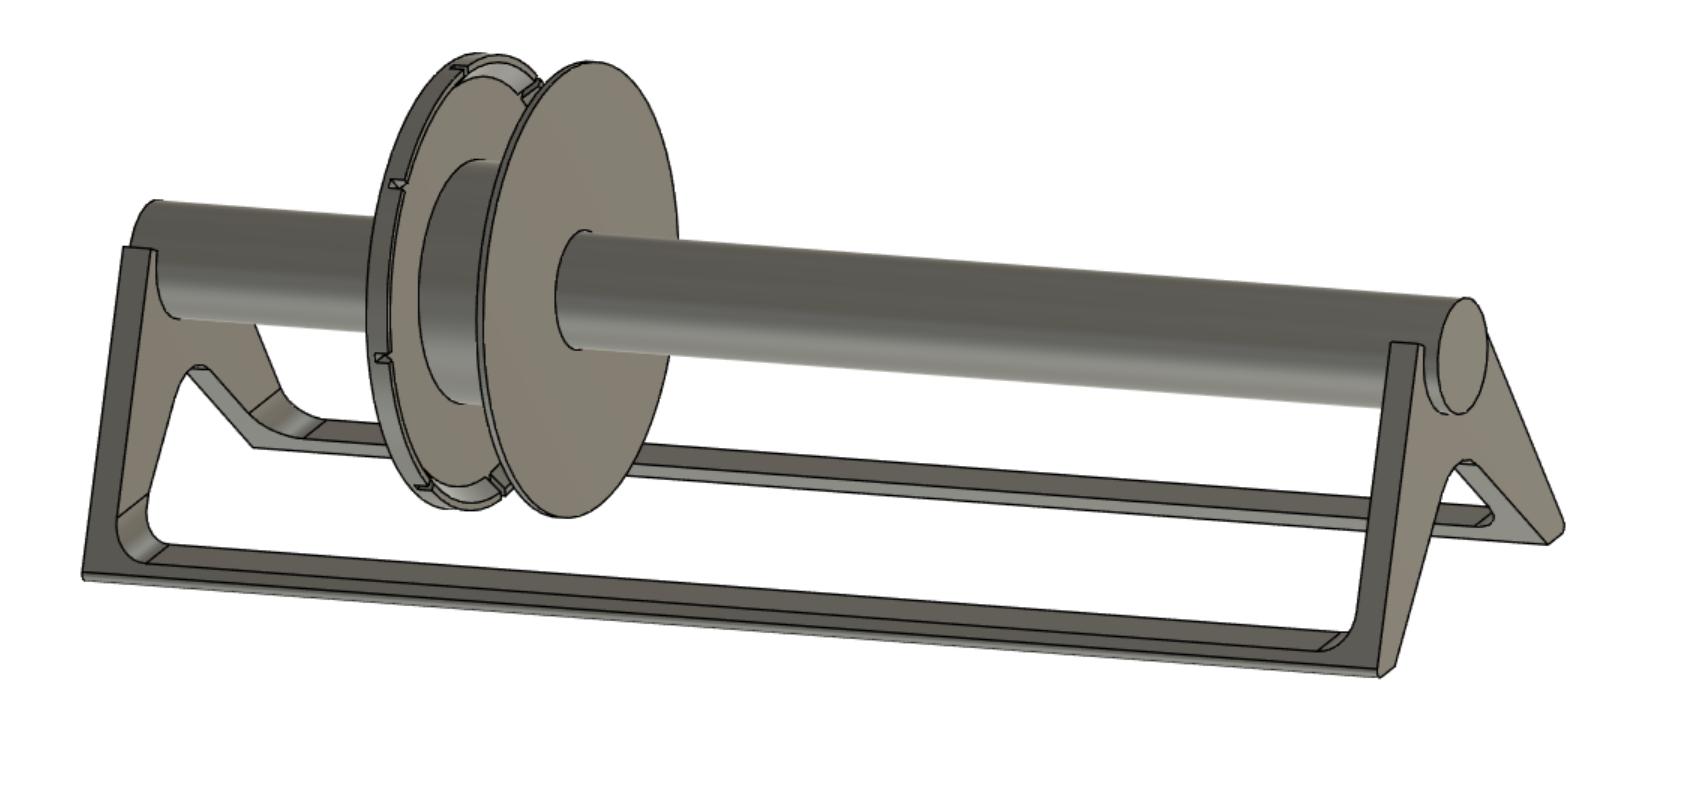 23 wire spool